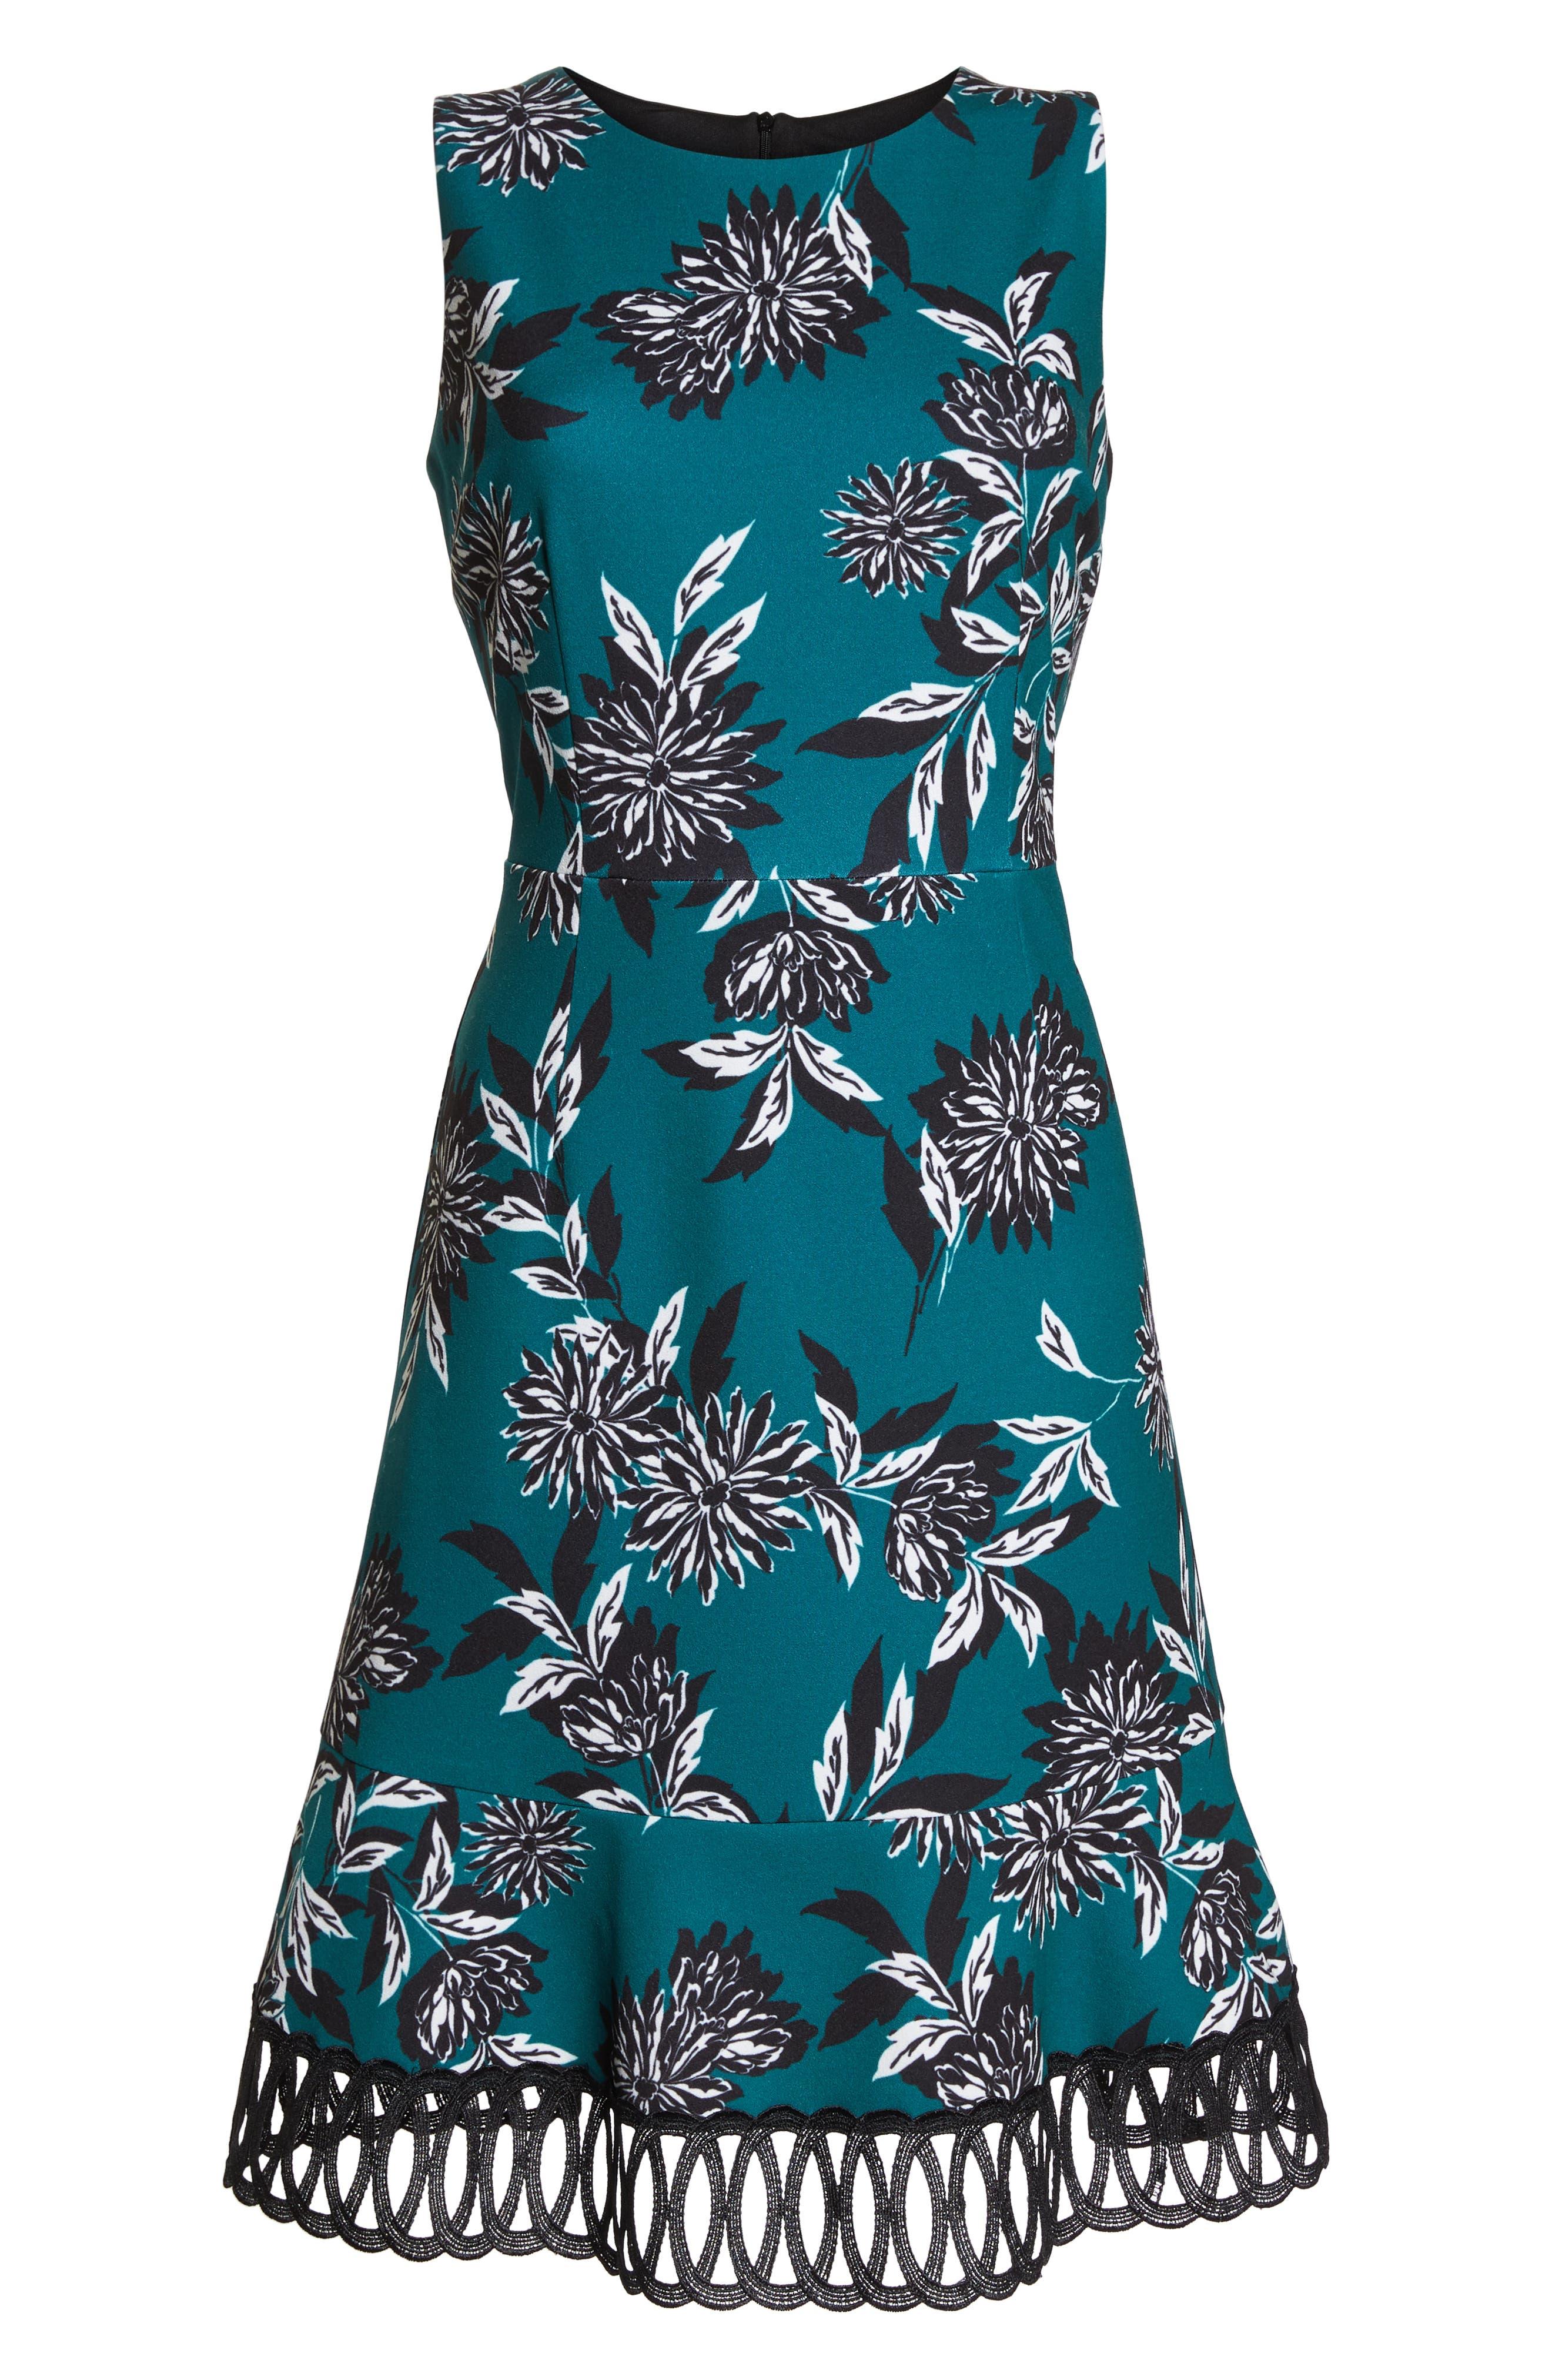 JULIA JORDAN, Crepe Scuba A-Line Dress, Alternate thumbnail 7, color, 300